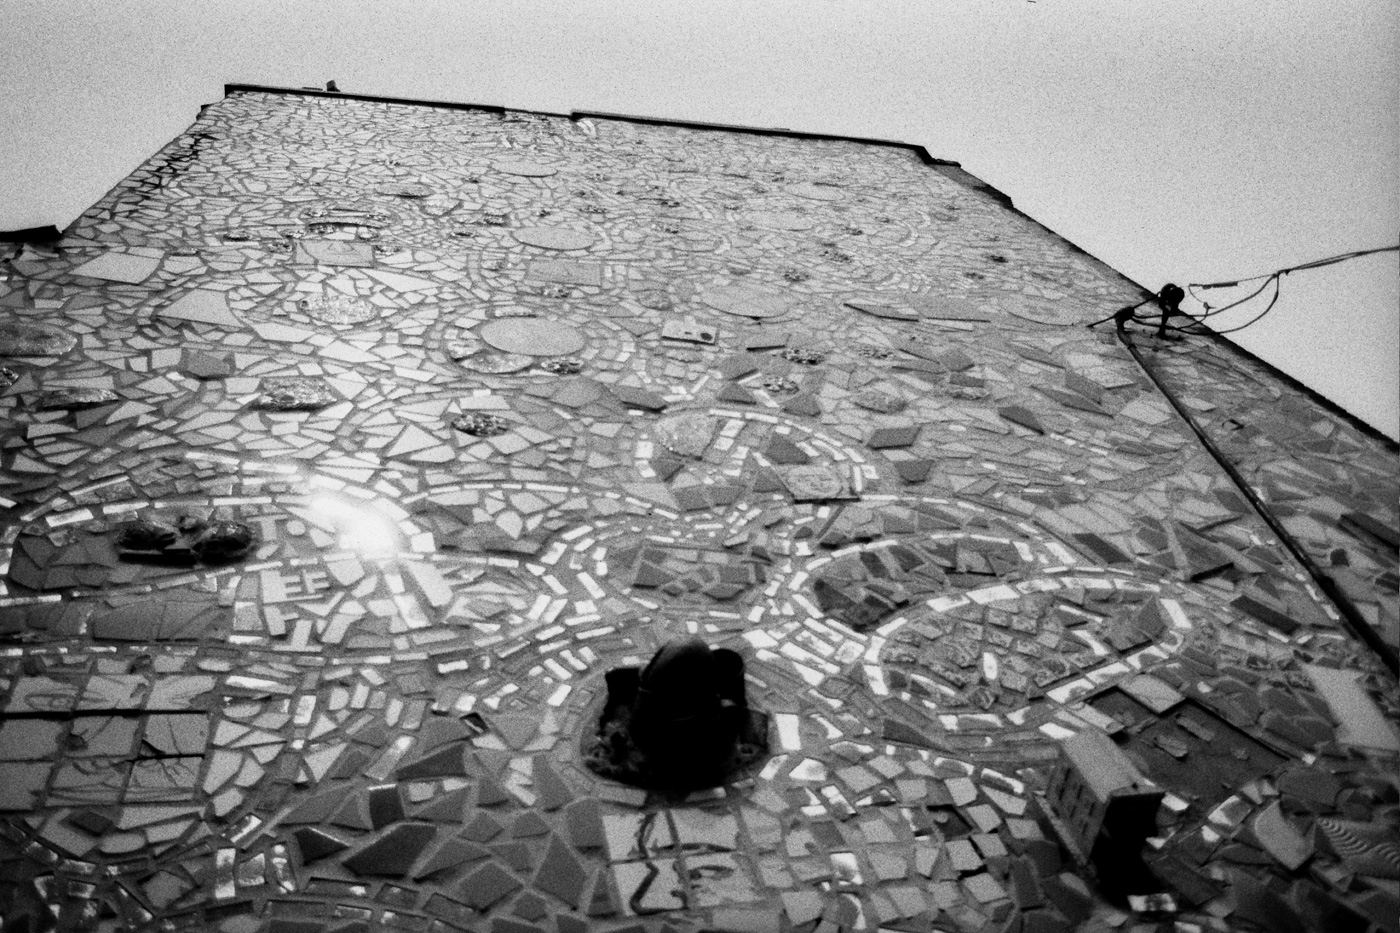 Mosaics All the Way Up